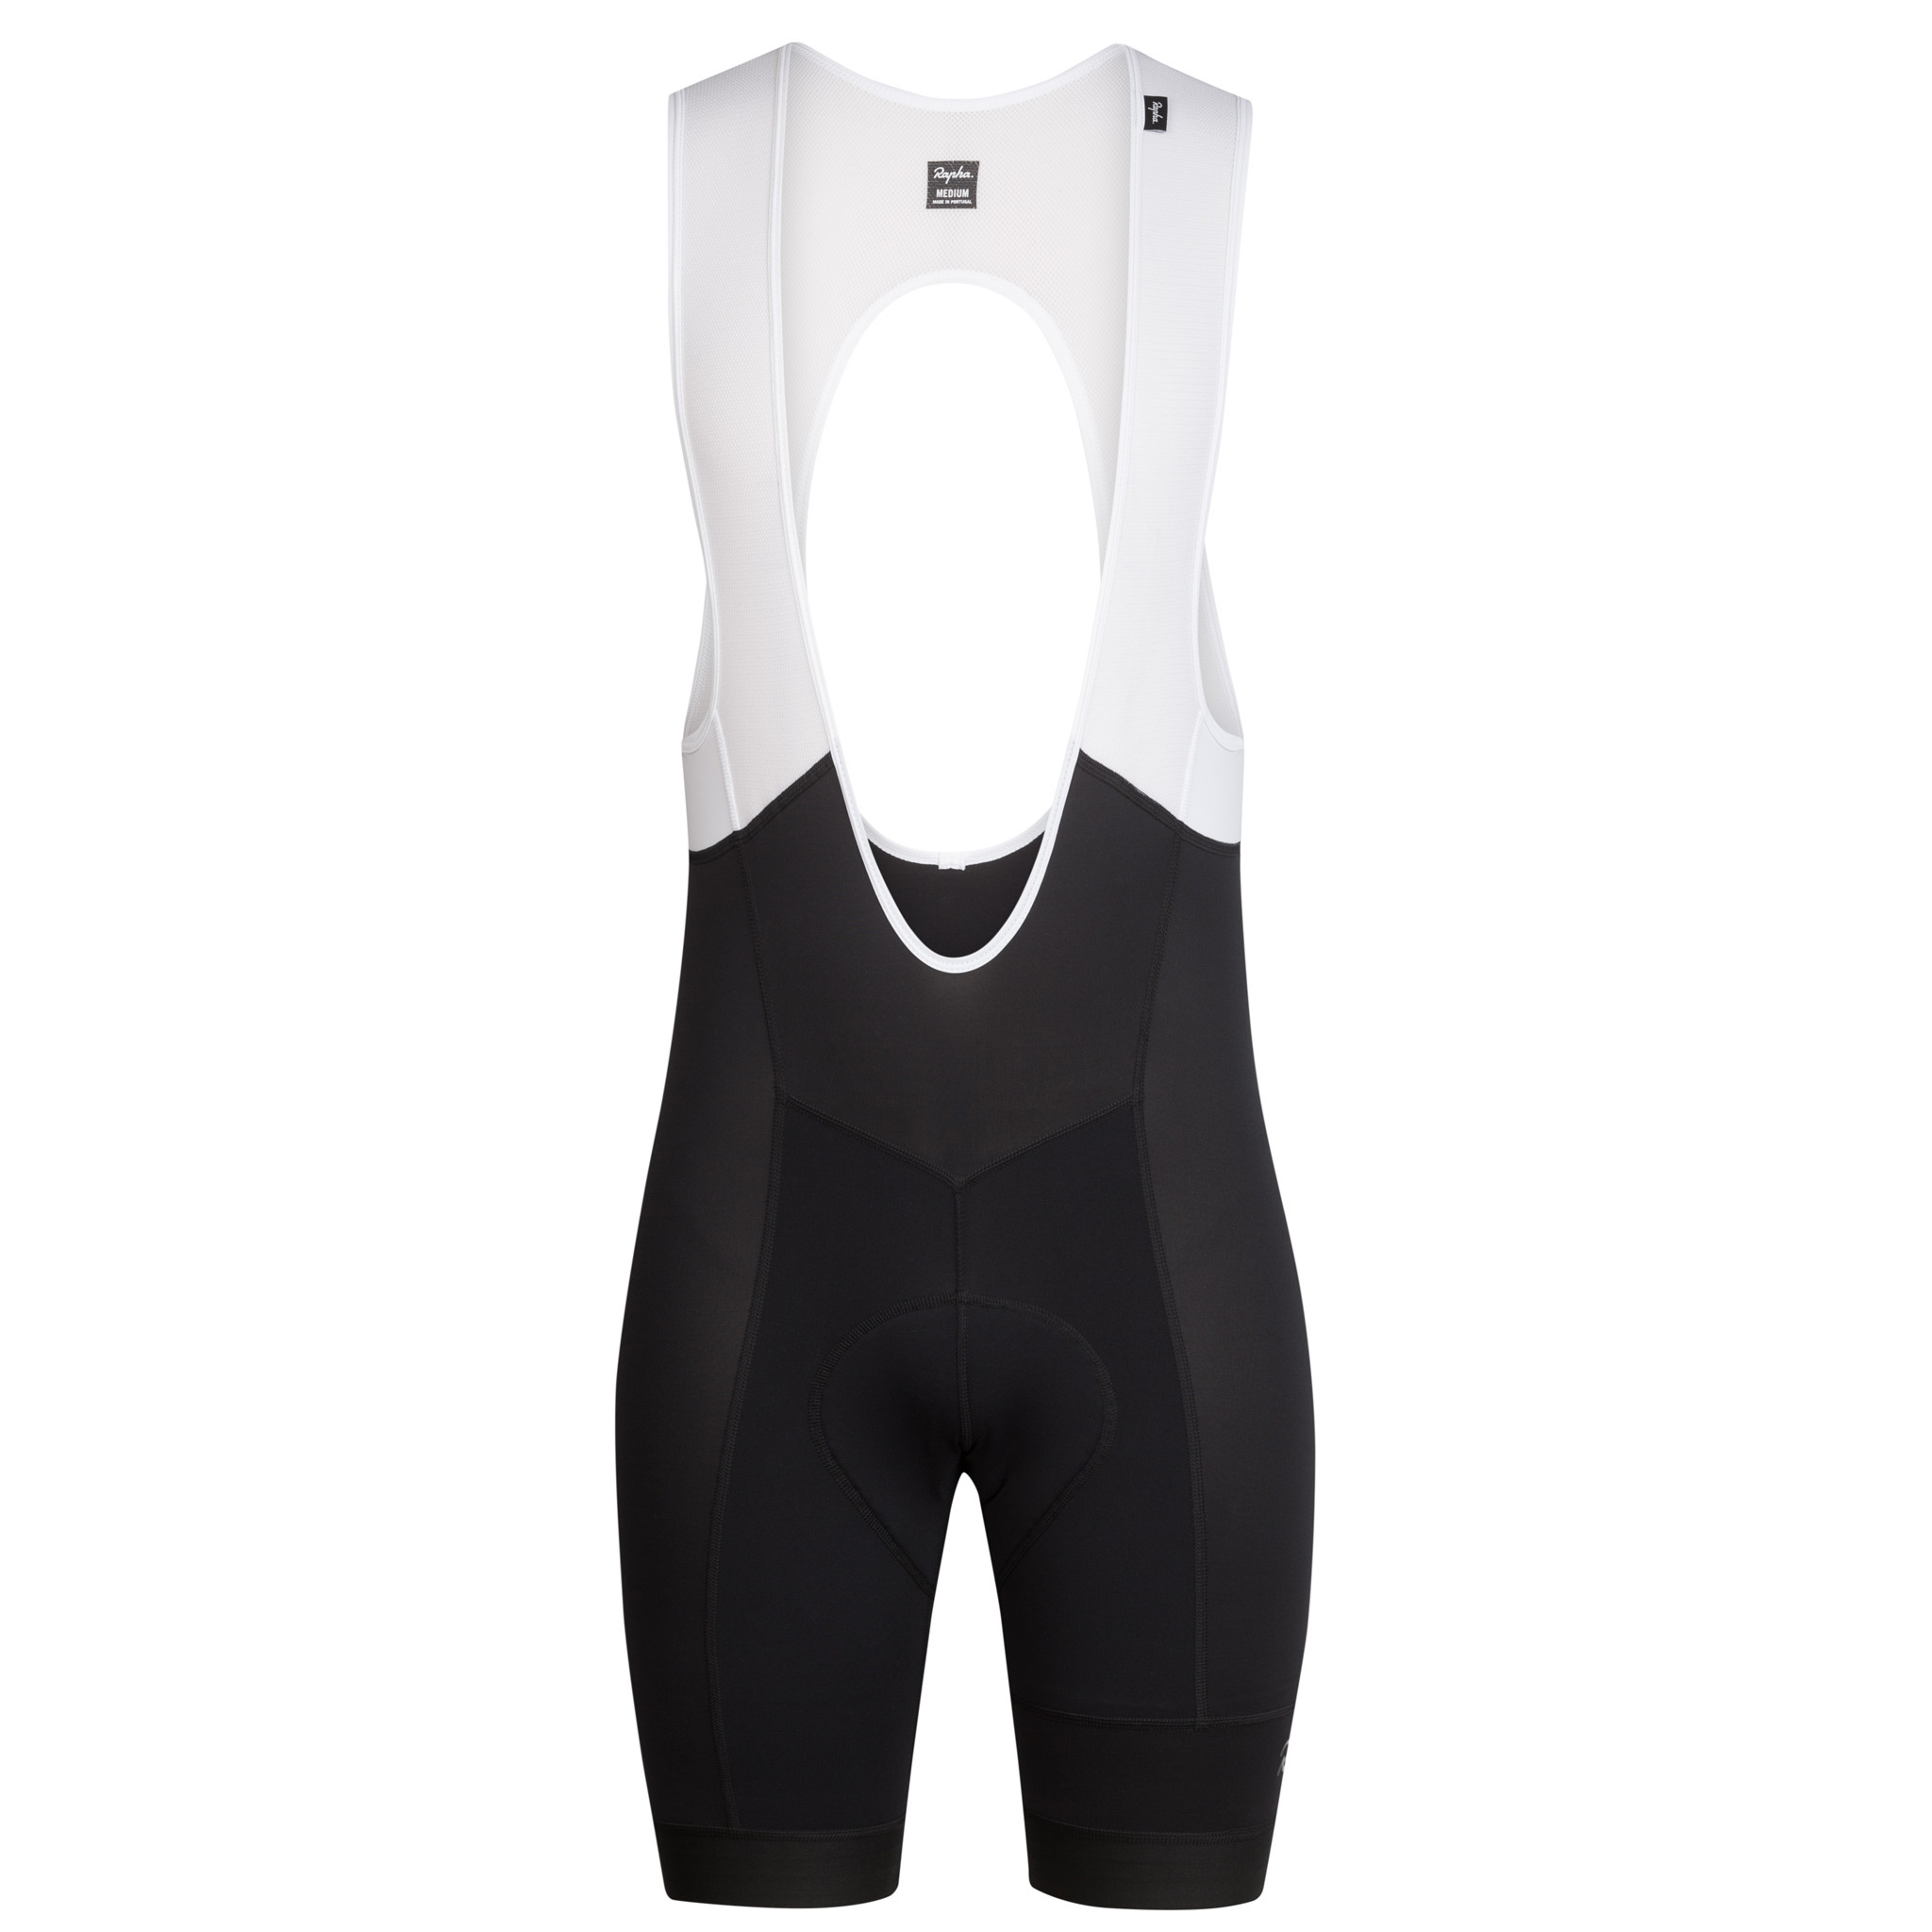 Lightweight Bib Shorts